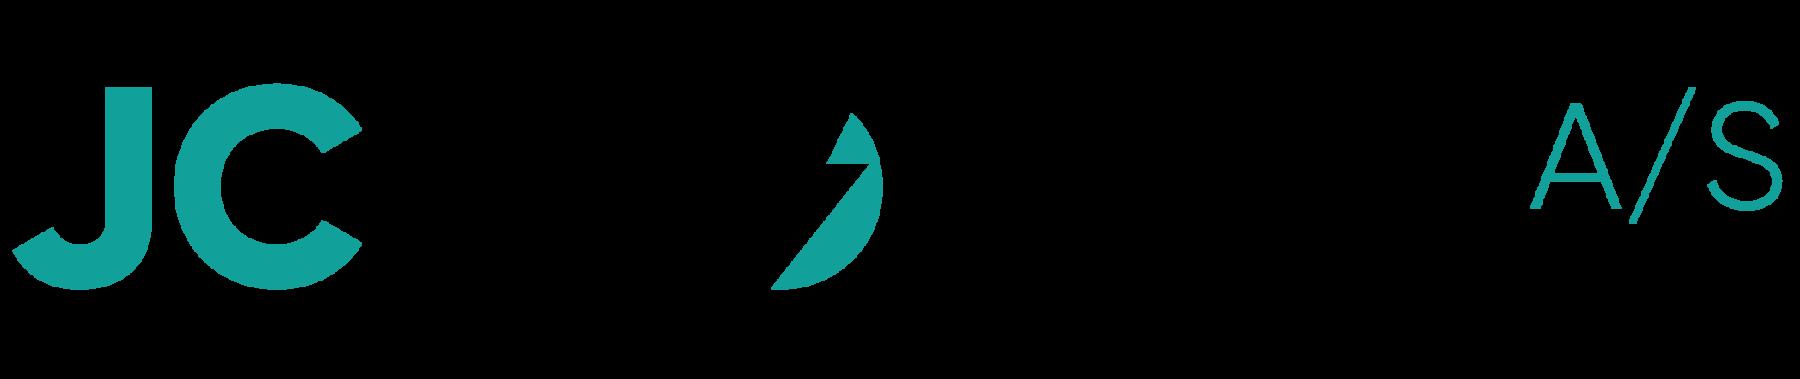 logo design til elektriker